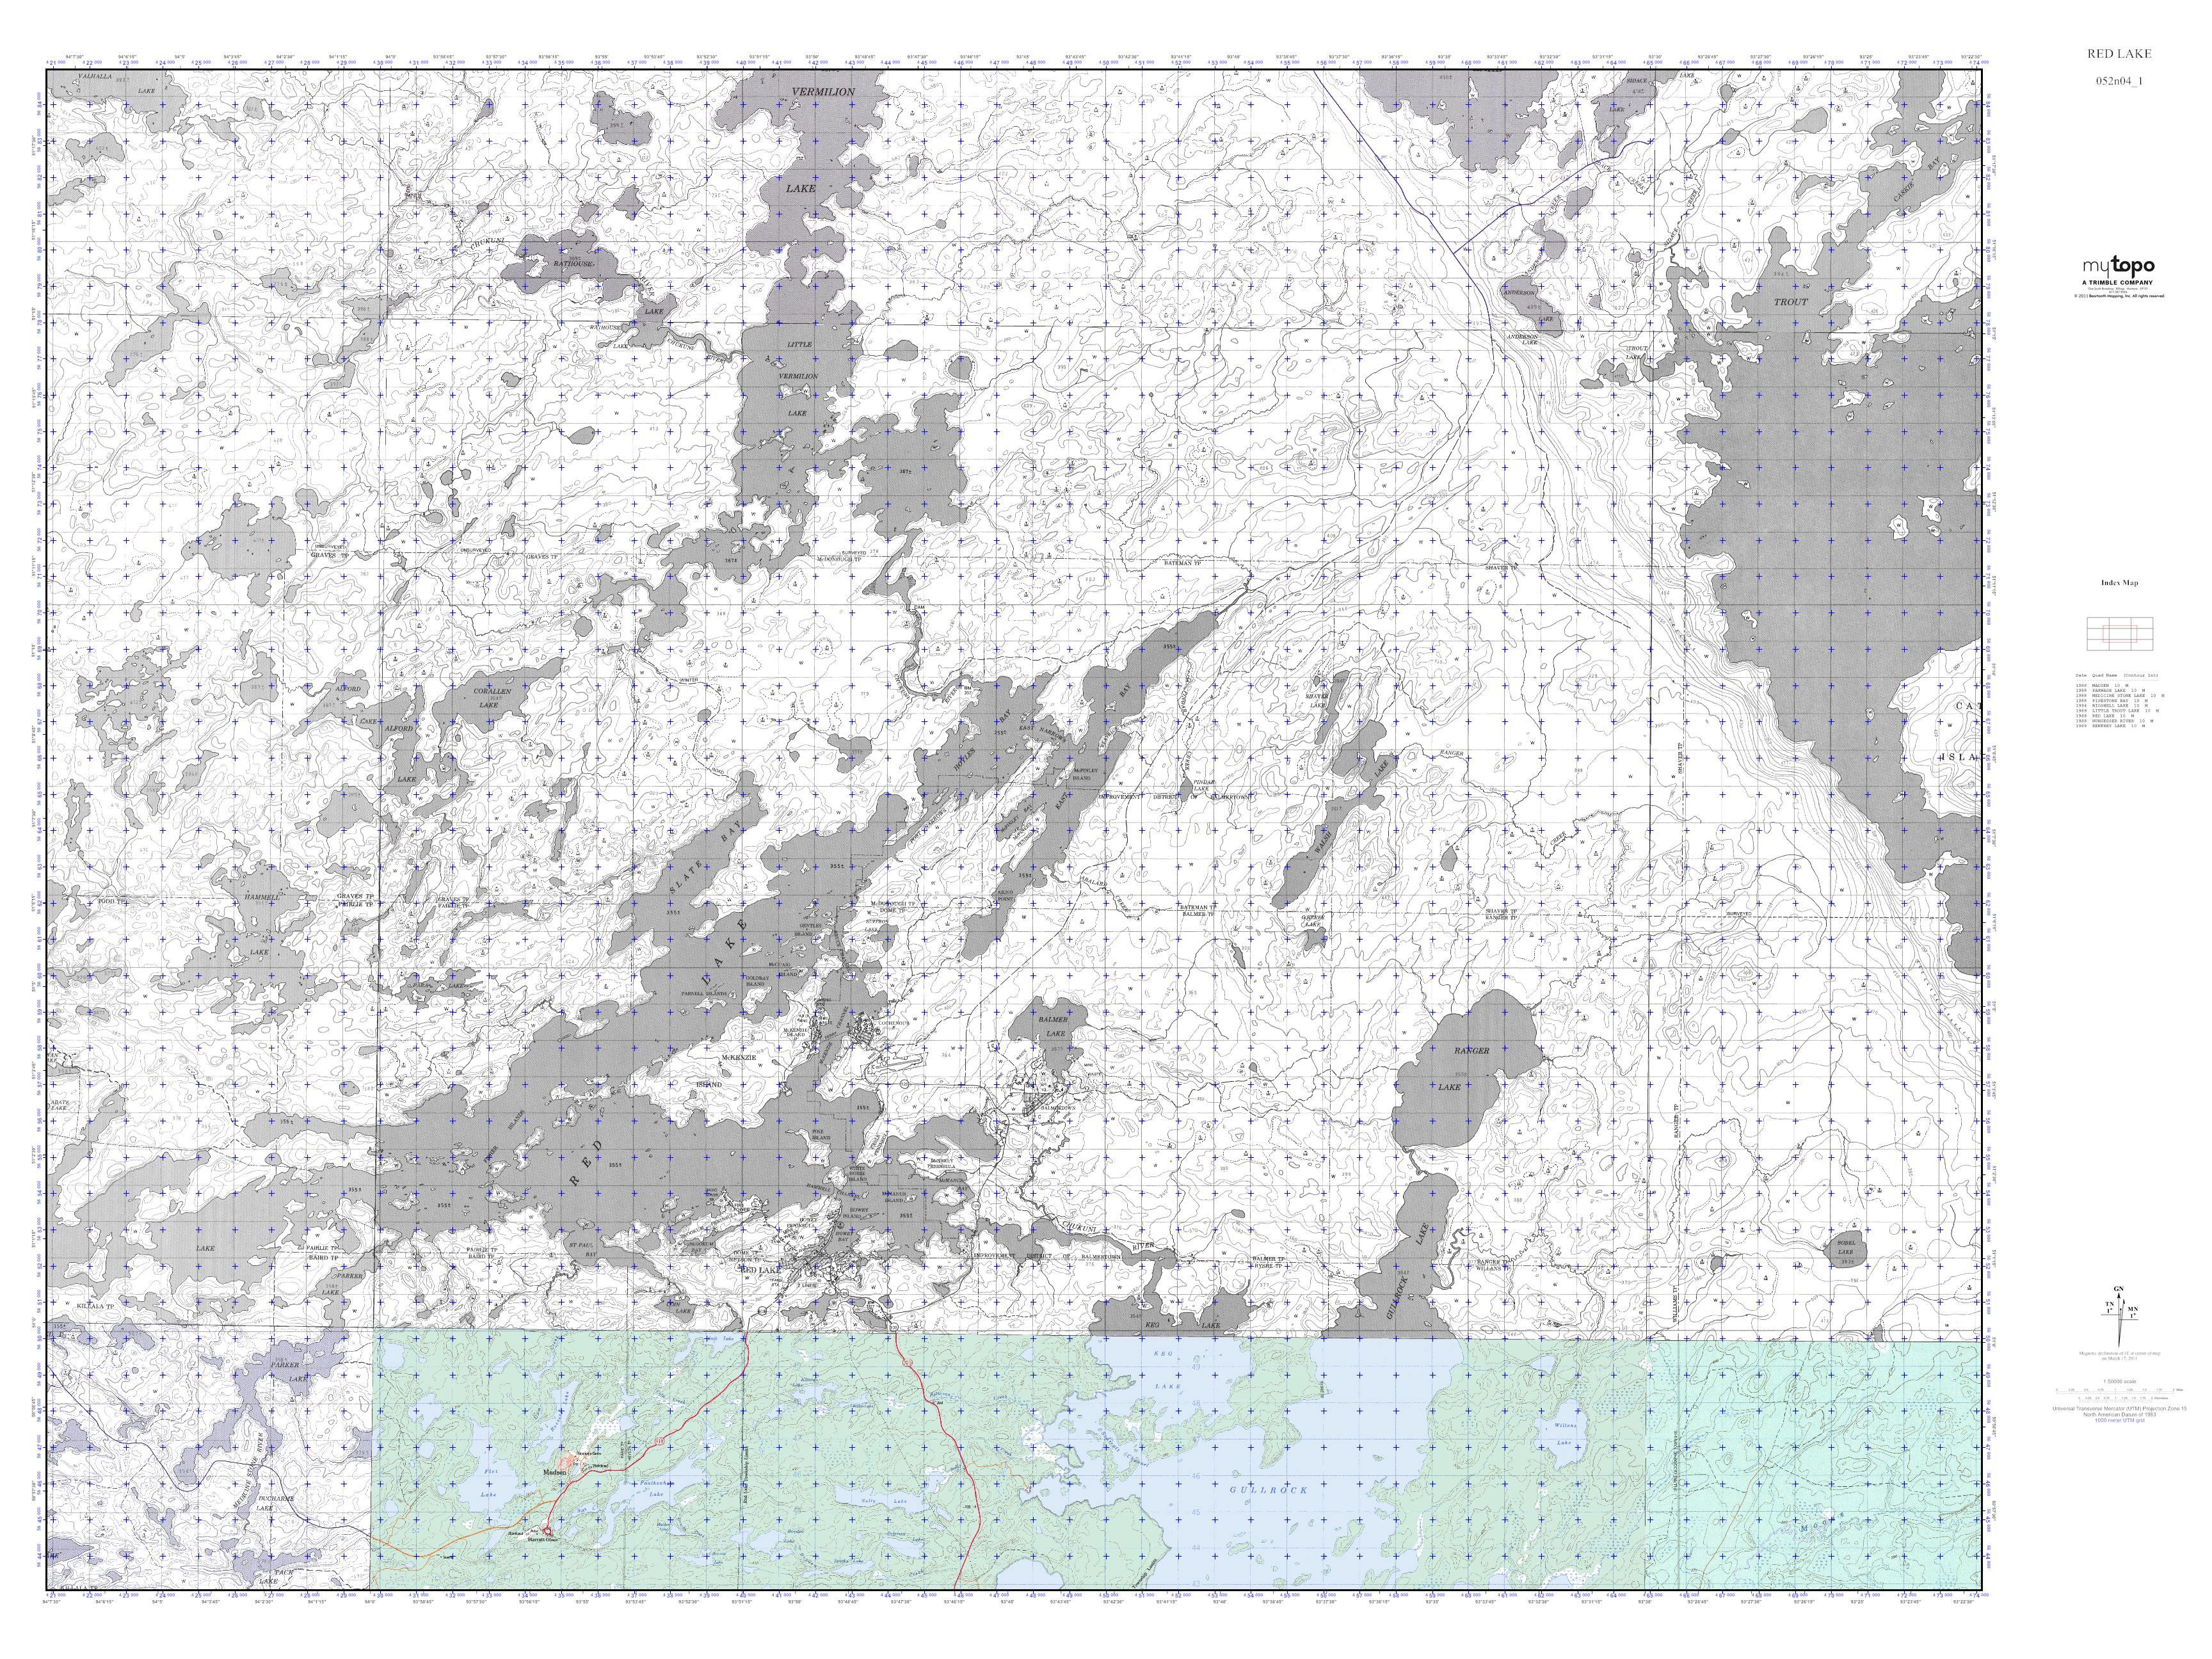 Ontario Topographic Map.Mytopo Red Lake Ontario Usgs Quad Topo Map